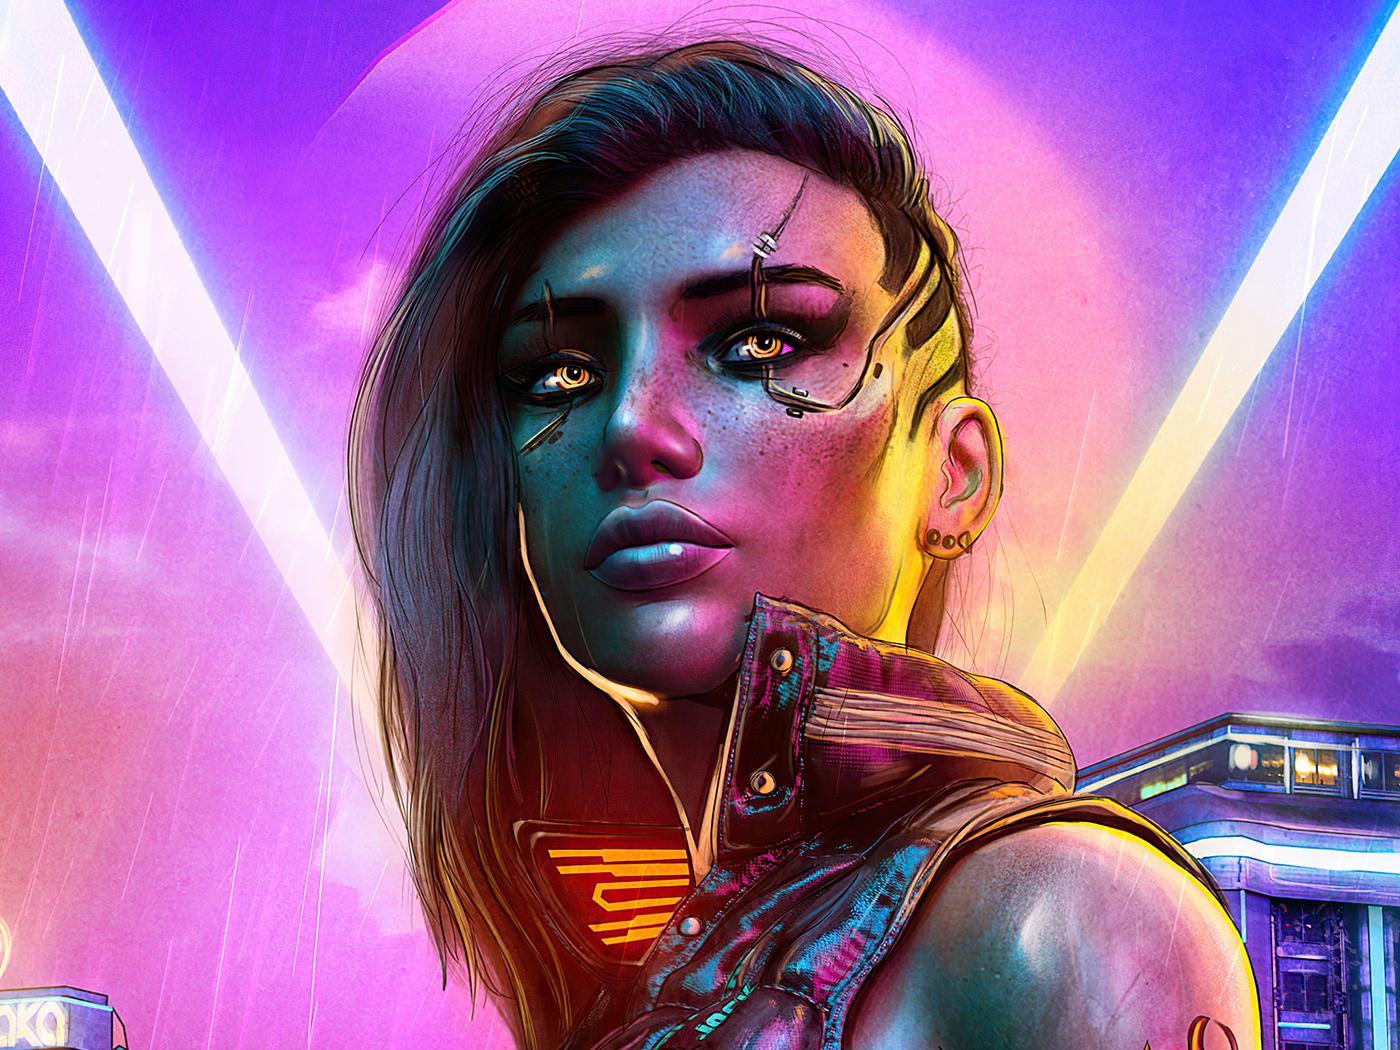 cyberpunk-2077-style-over-substance-4k-4p.jpg